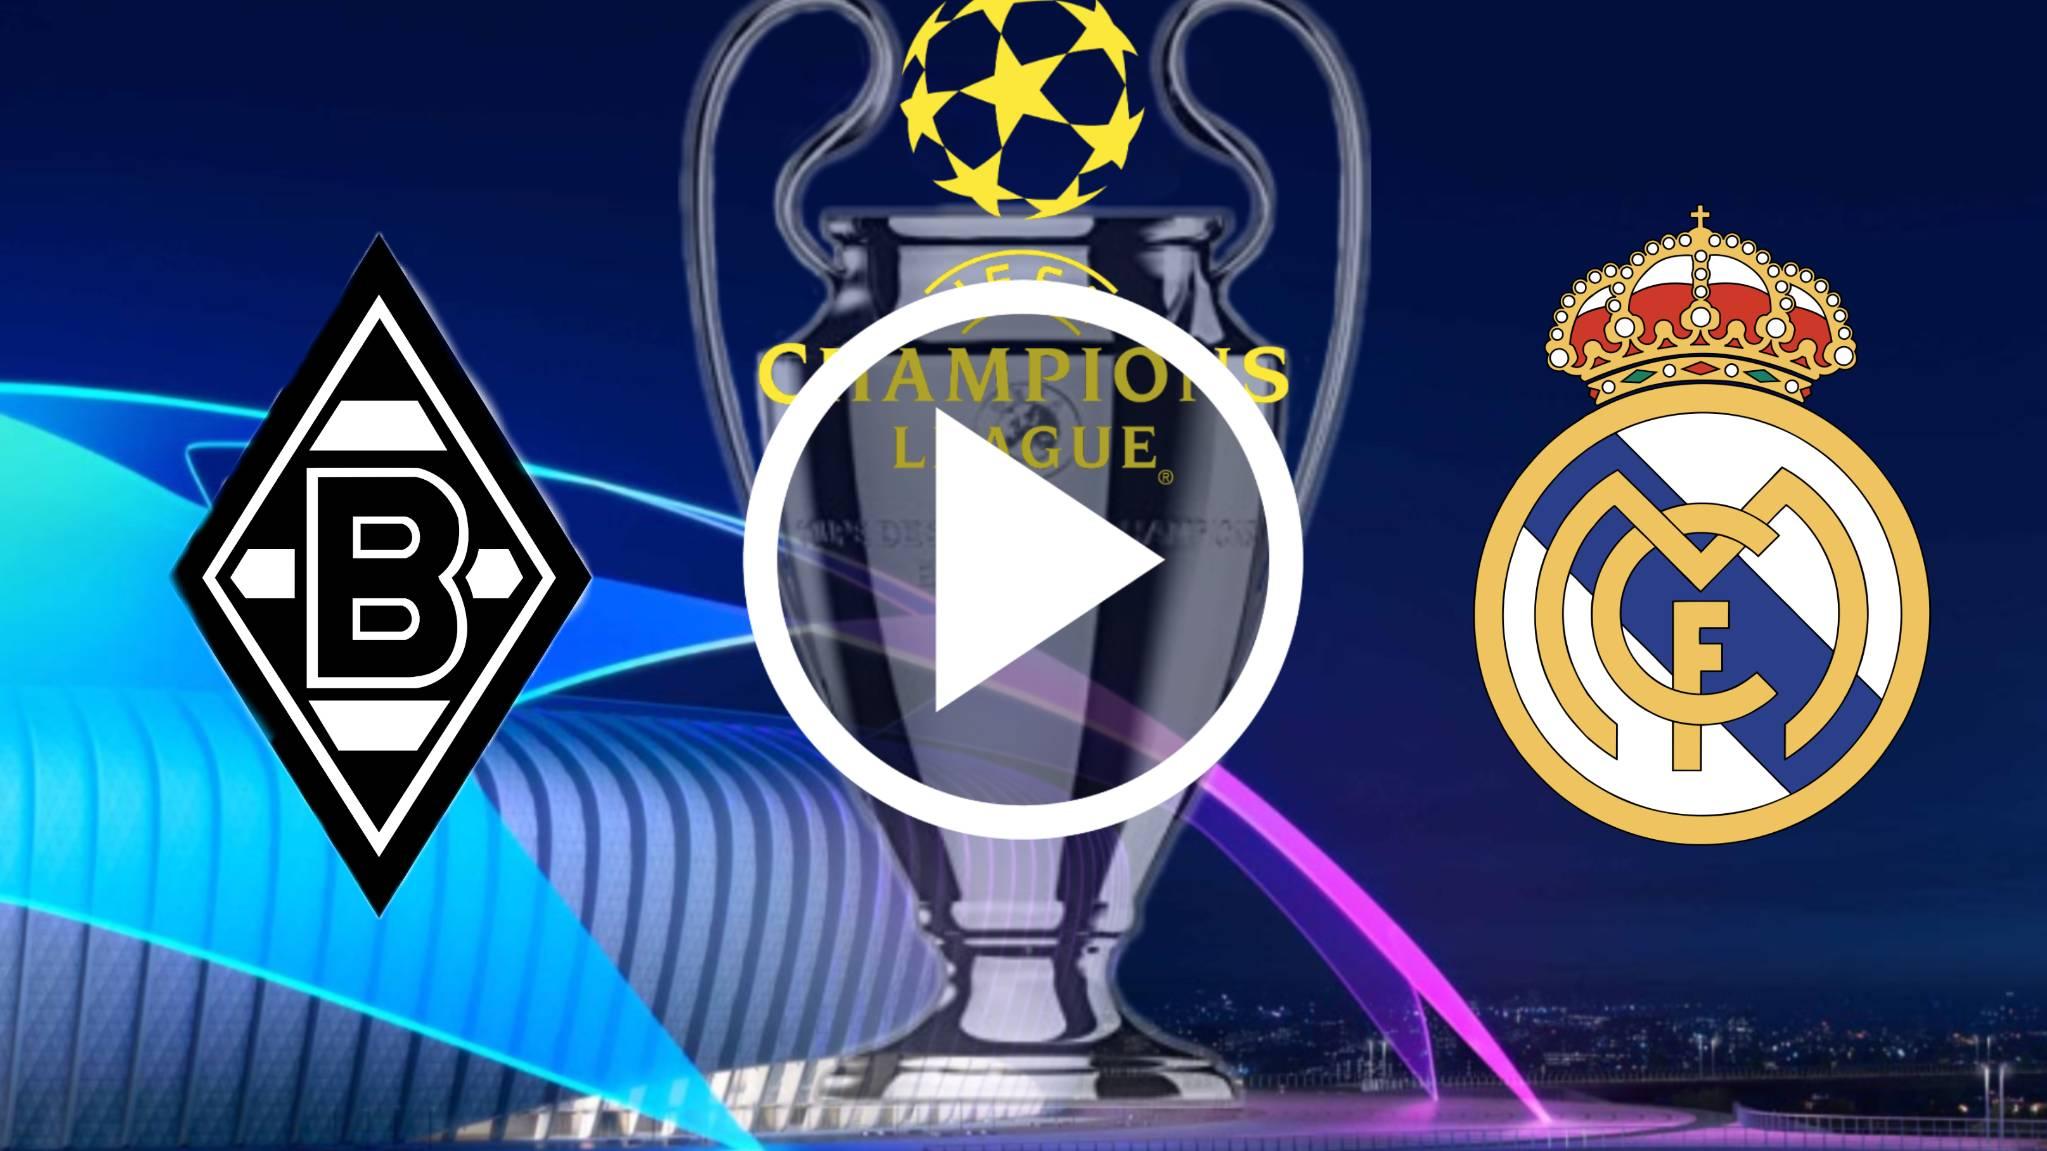 AQUI NO TE PIERDAS SIN CORTES Borussia Mönchengladbach vs Real Madrid ONLINE EN VIVO  PRO LA la UEFA Champions League 20-21